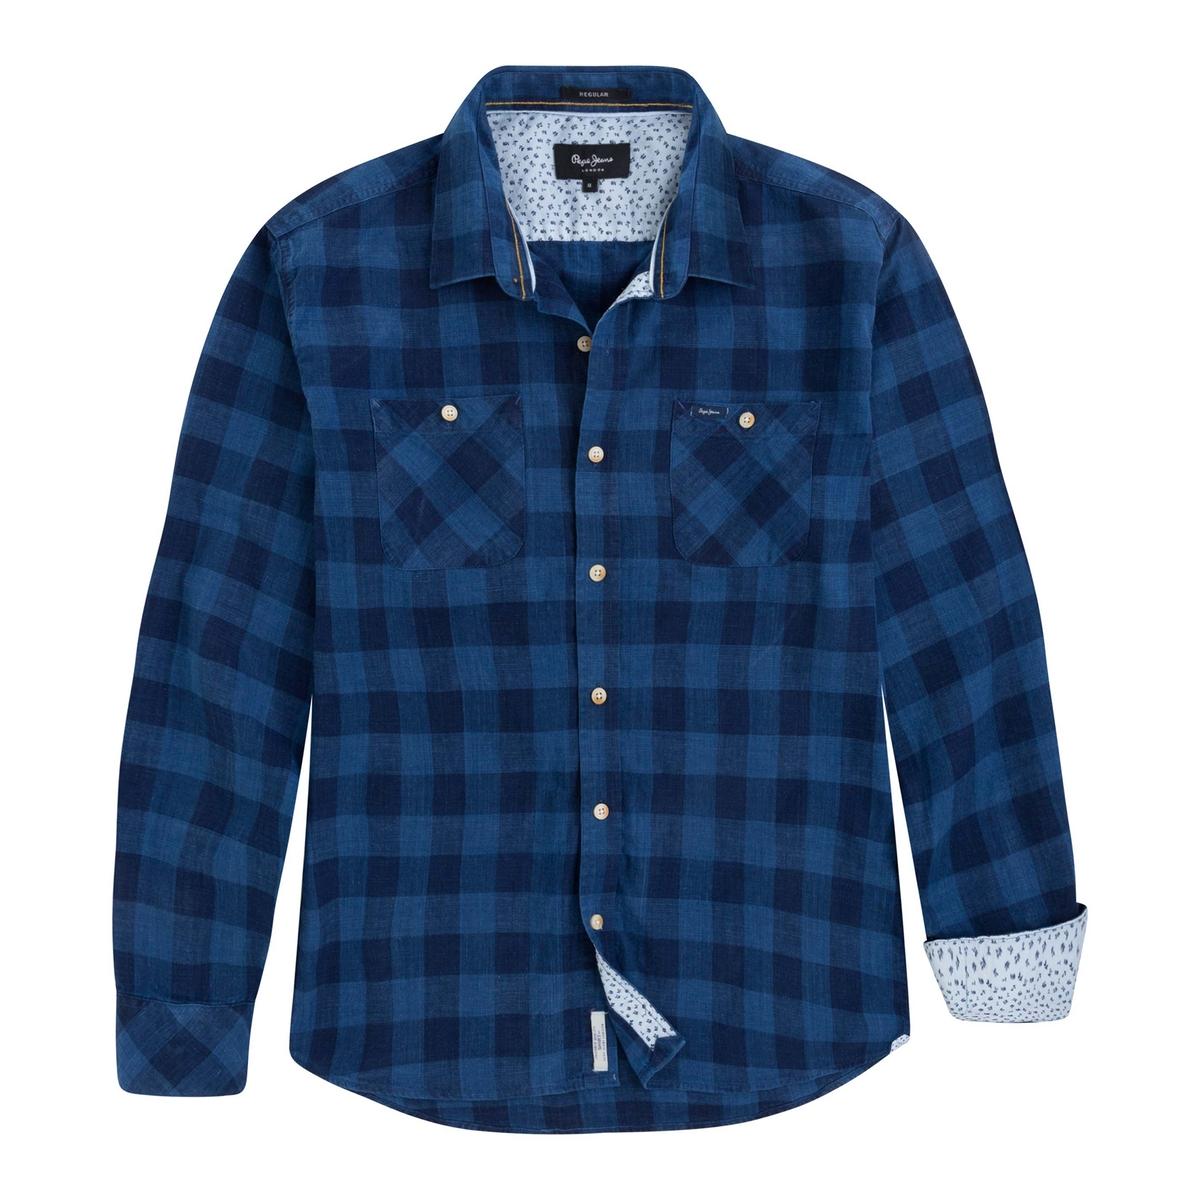 Camisa ALBANY recto a cuadros, 100% algodón